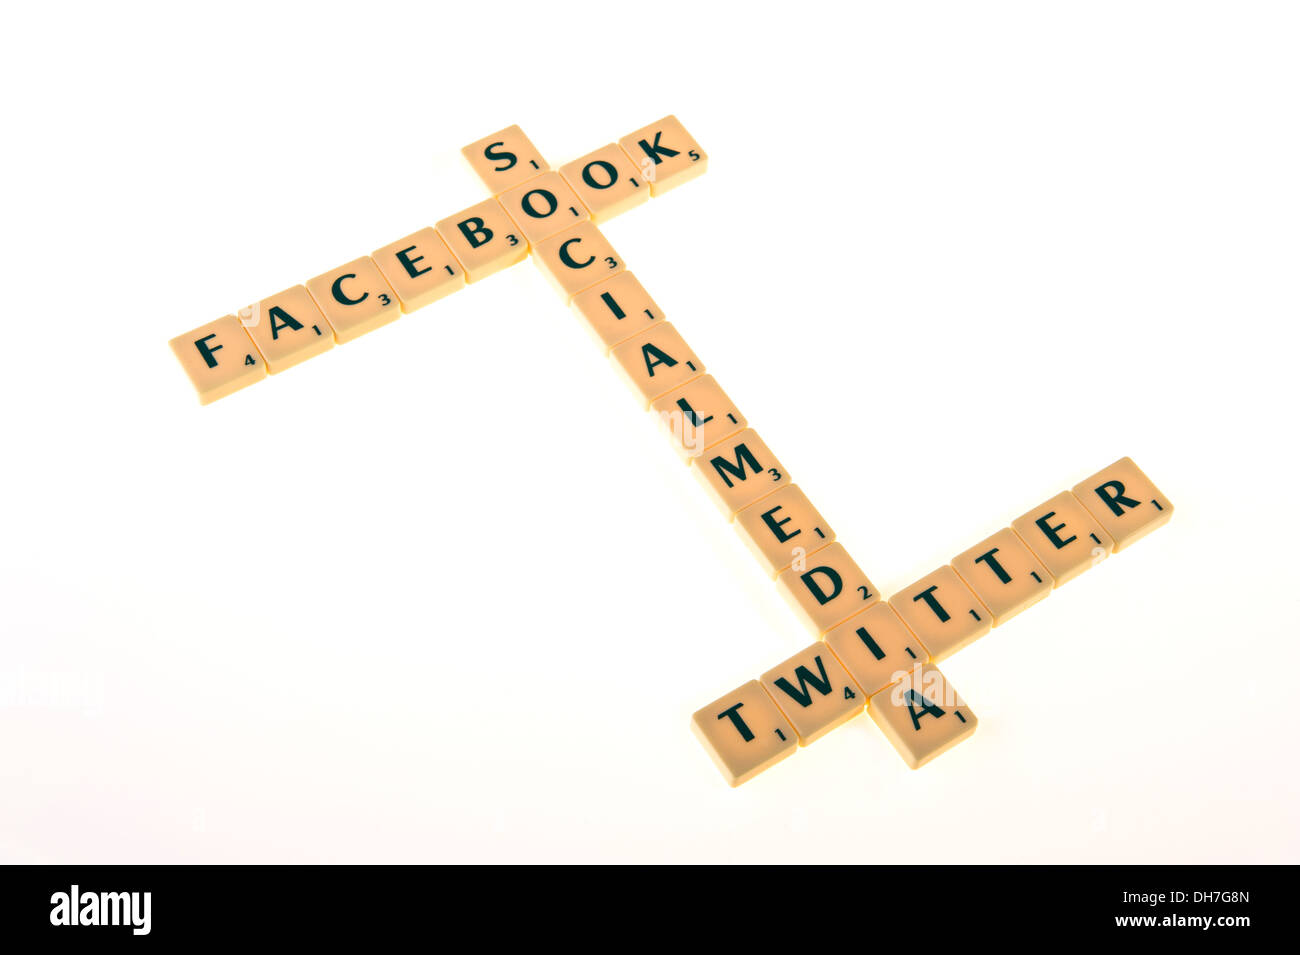 Scrabble tiles spelling out - facebook, social media,twitter. - Stock Image